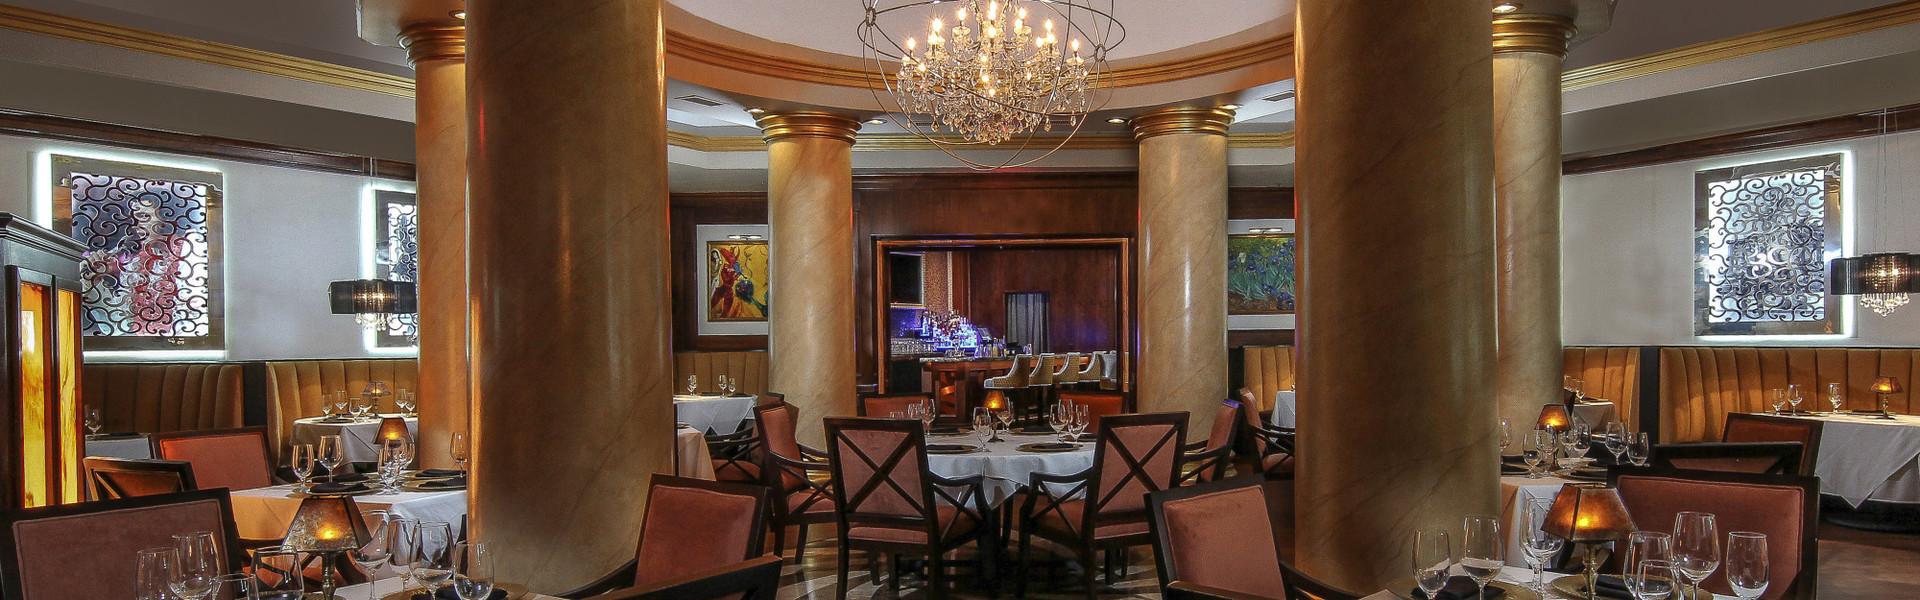 Las Vegas restaurants from casual to elegant at Westgate Las Vegas Resort | Las Vegas NV